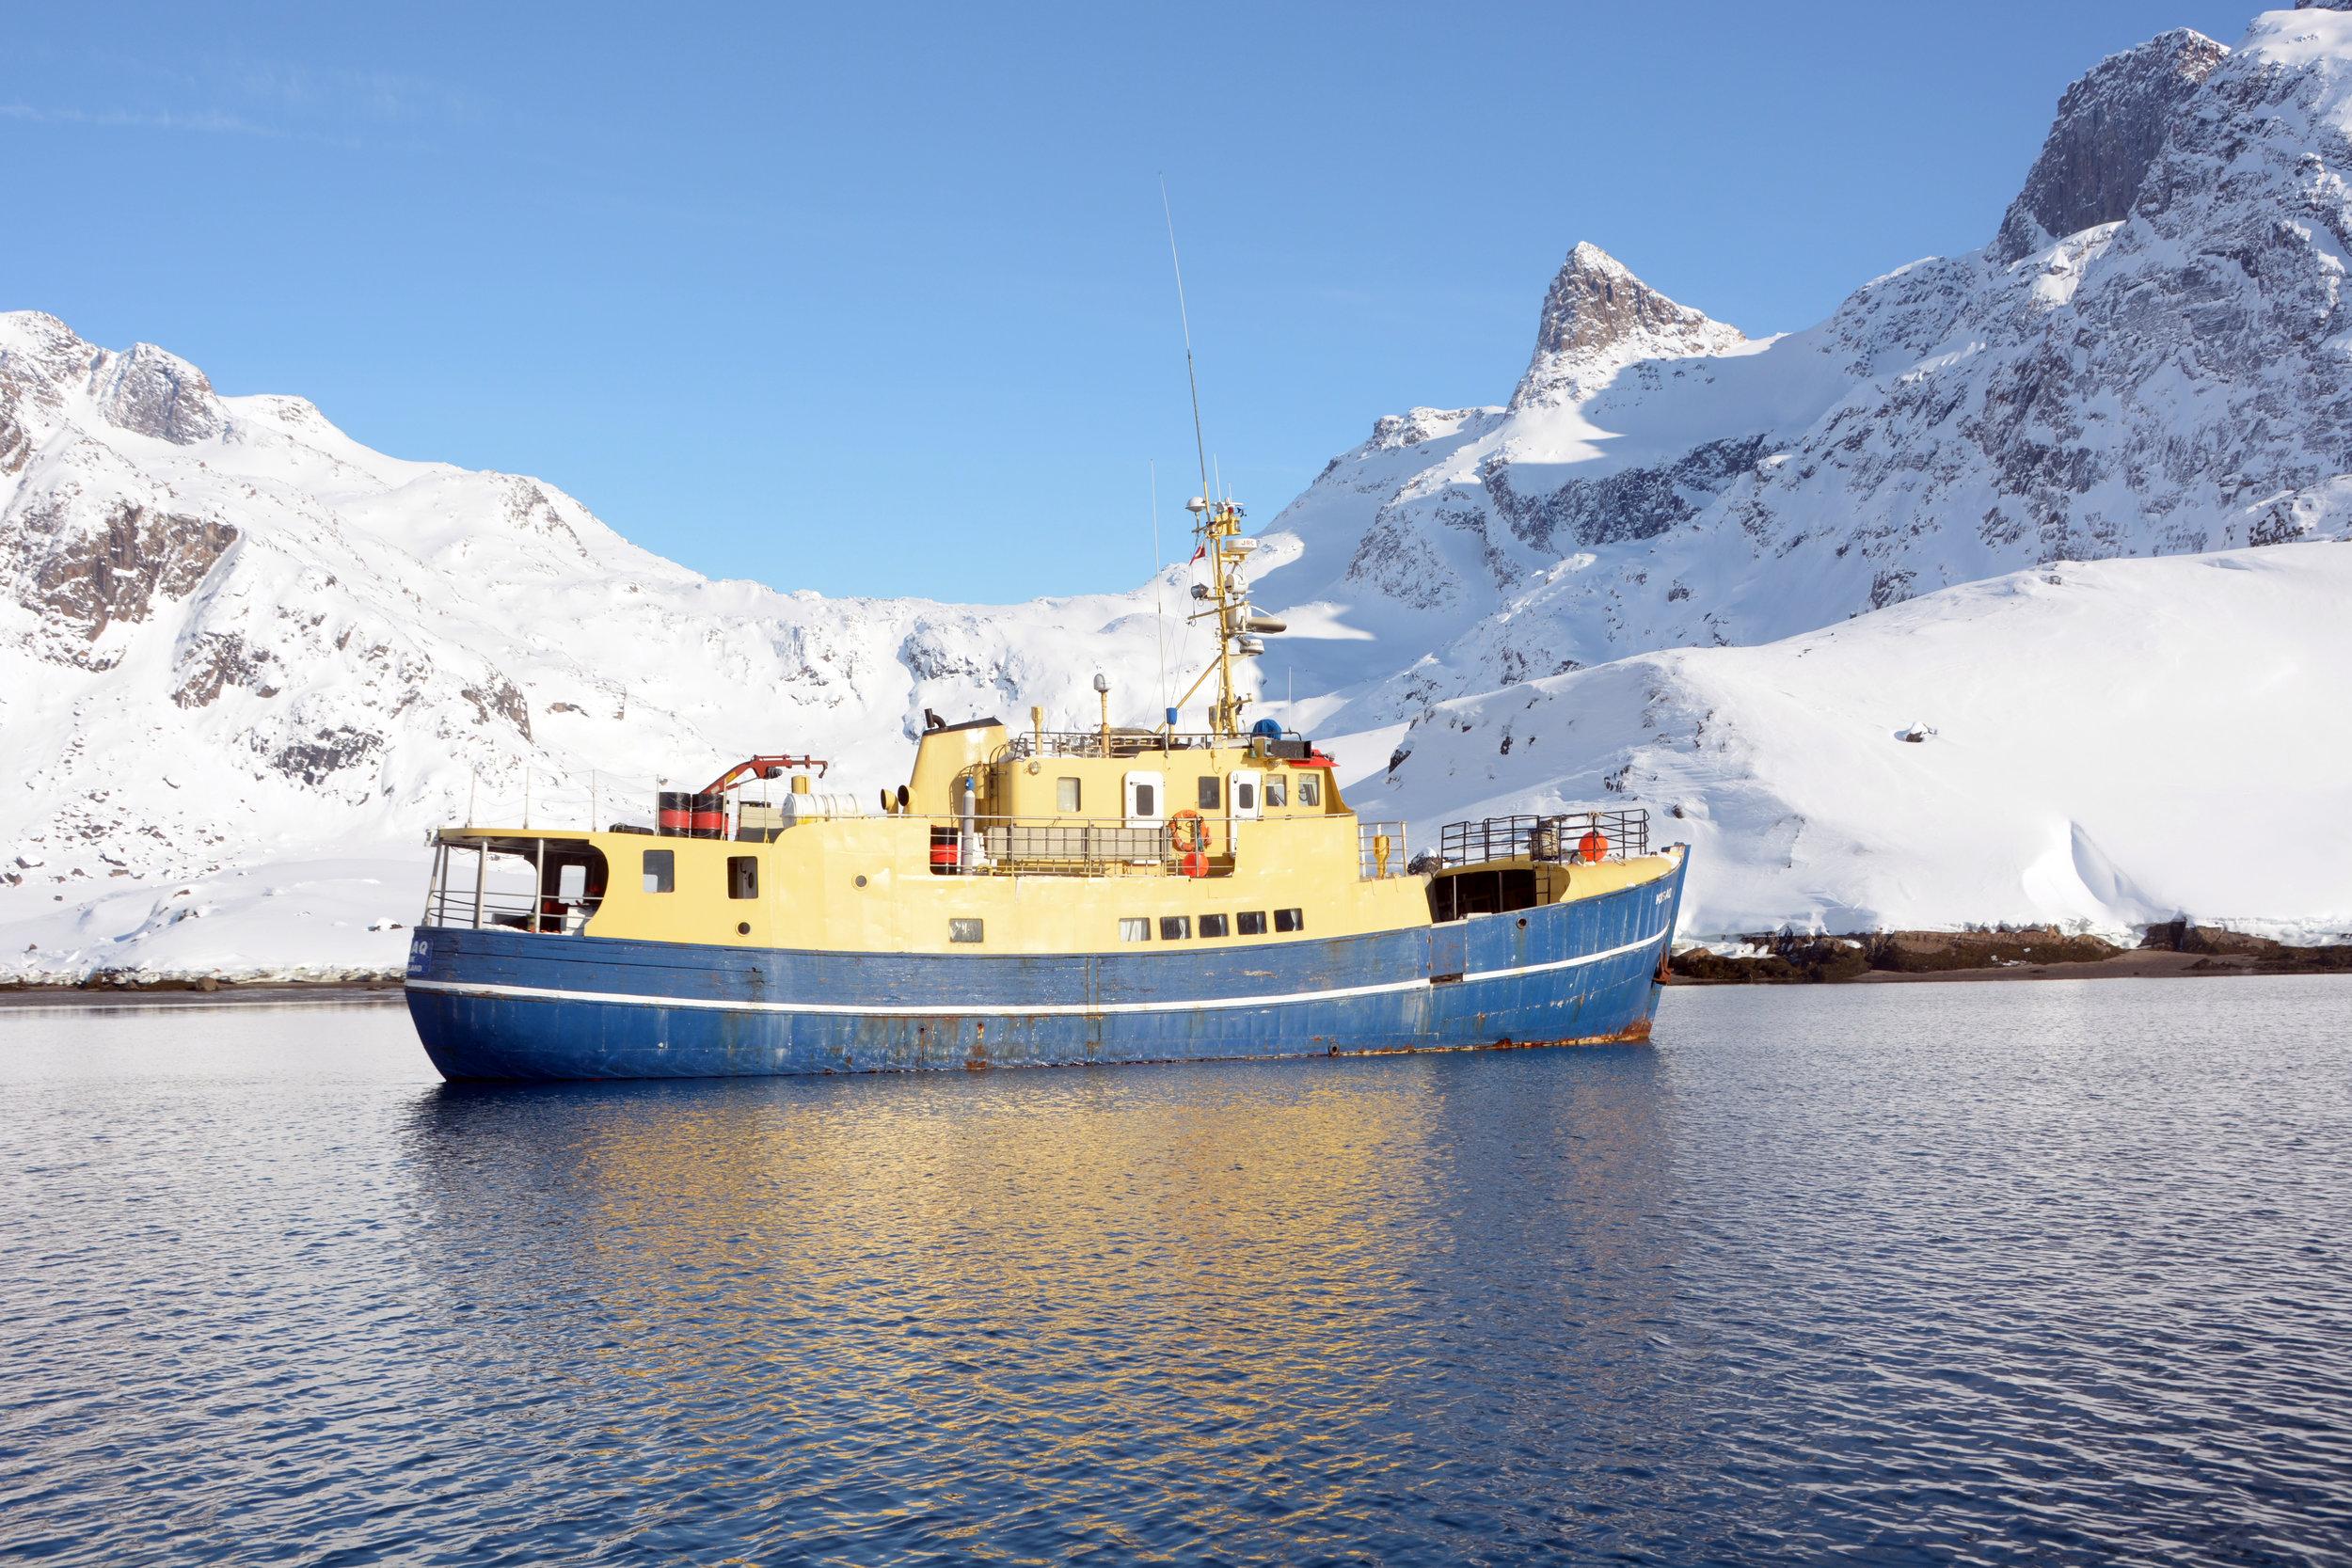 Powderbird-Greenland-Gallery-Images-Ship-Kisaq15.jpg